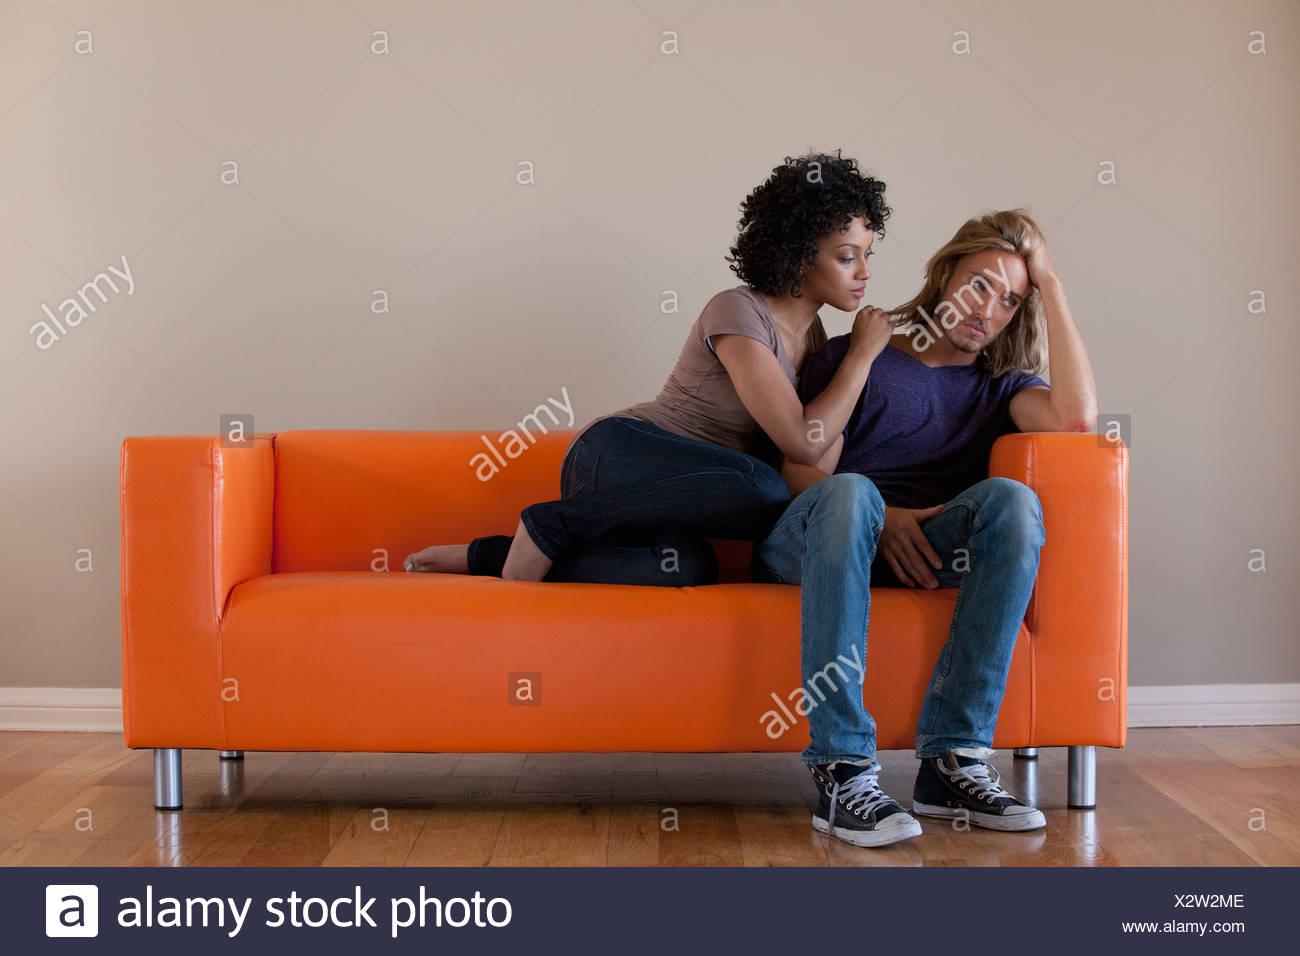 USA, California, Los Angeles, Young couple sitting on sofa - Stock Image